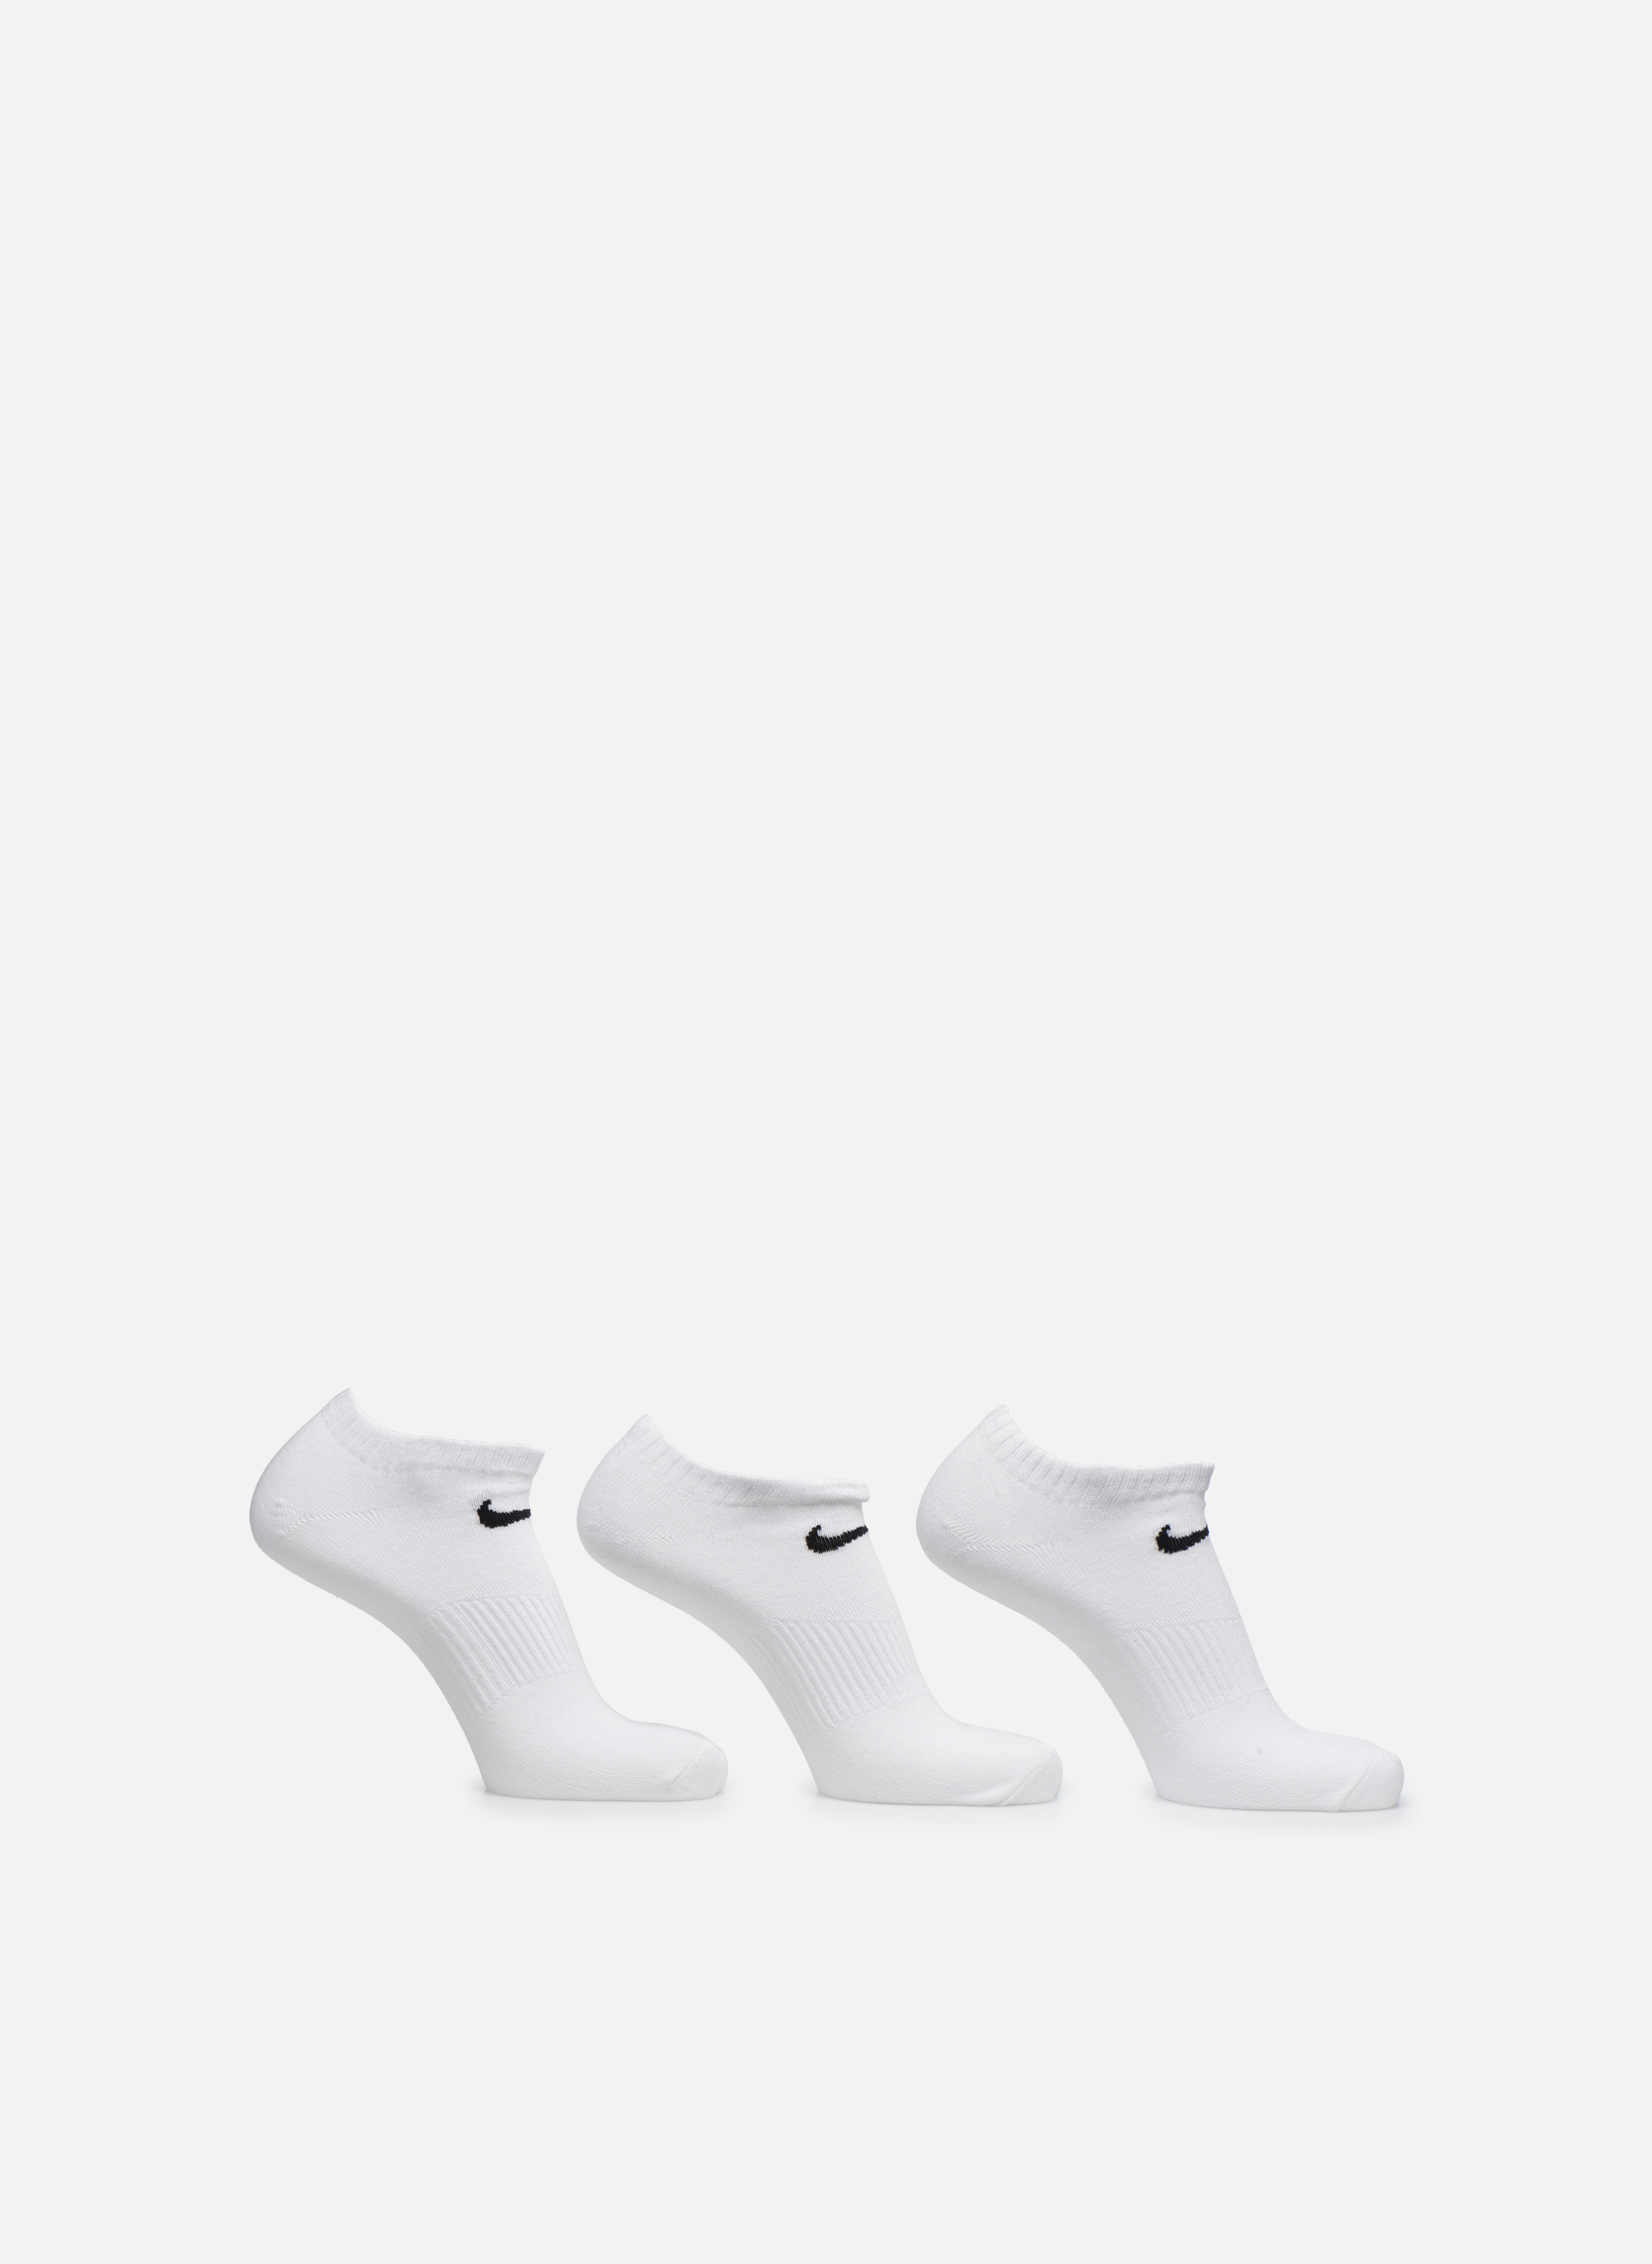 Unisex Nike Performance Lightweight No Show Training Sock 3PR